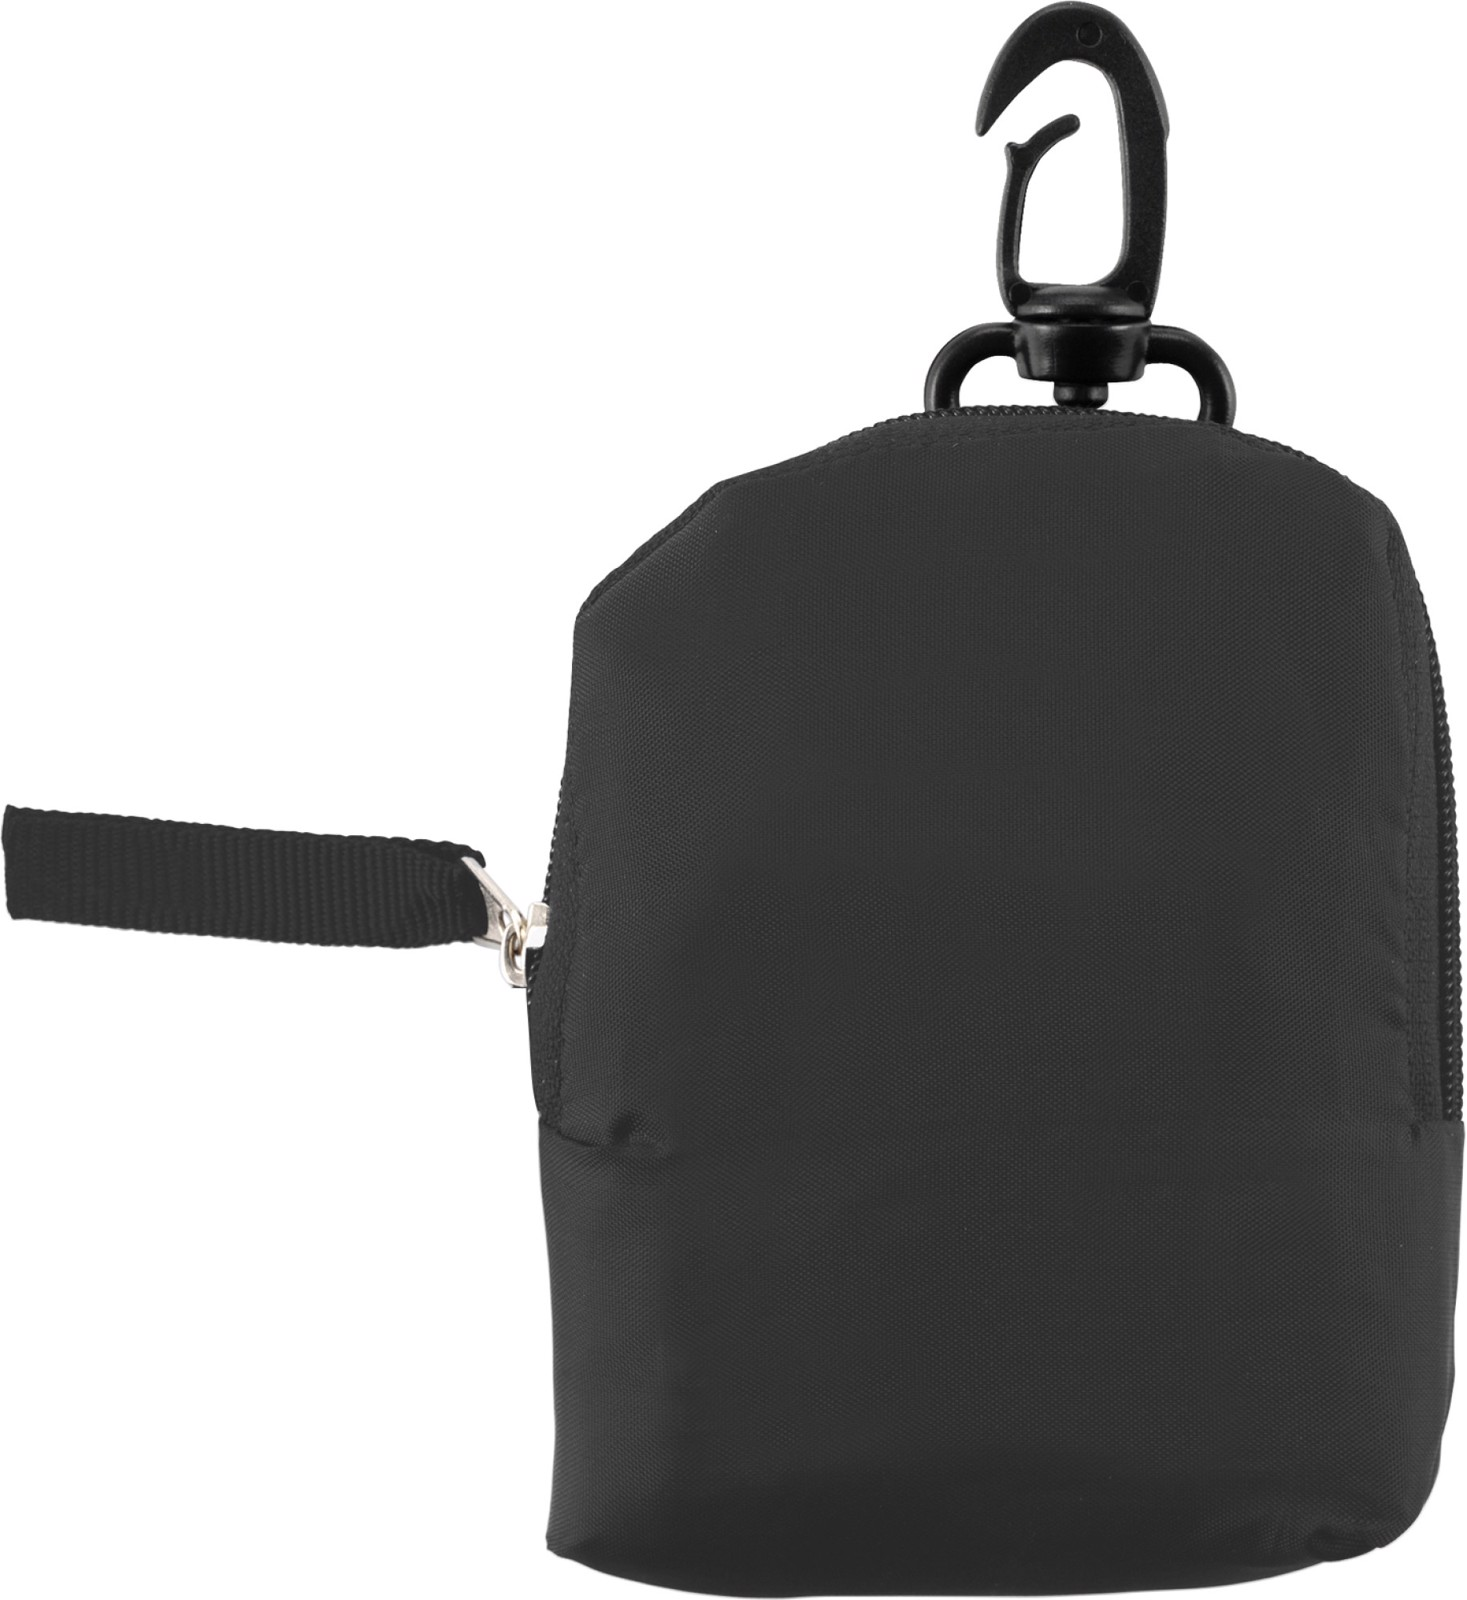 Polyester (190T) shopping bag - Black